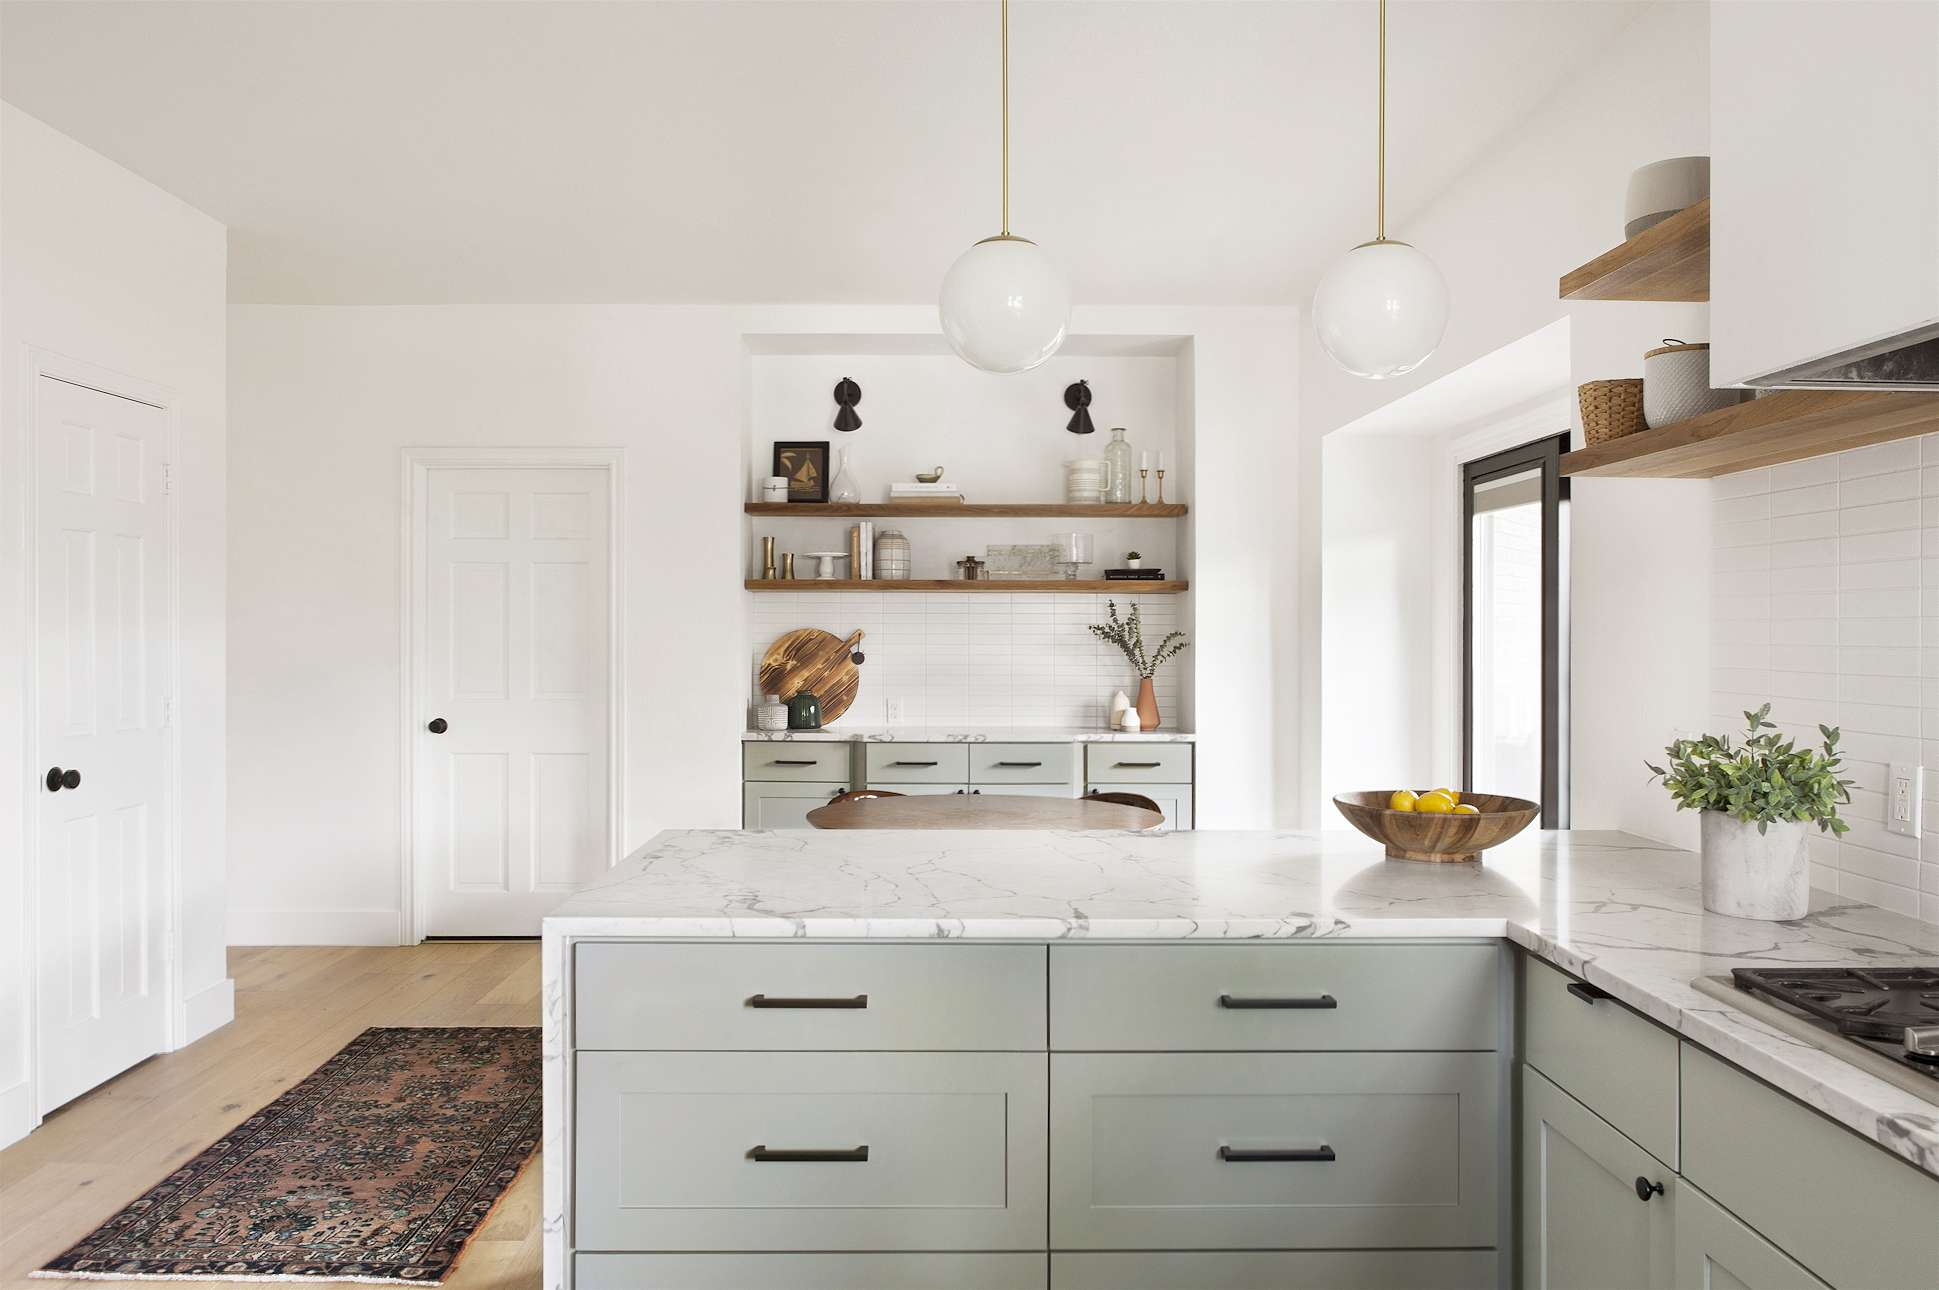 Mid-Century Modern style kitchen with white globe light fixtures